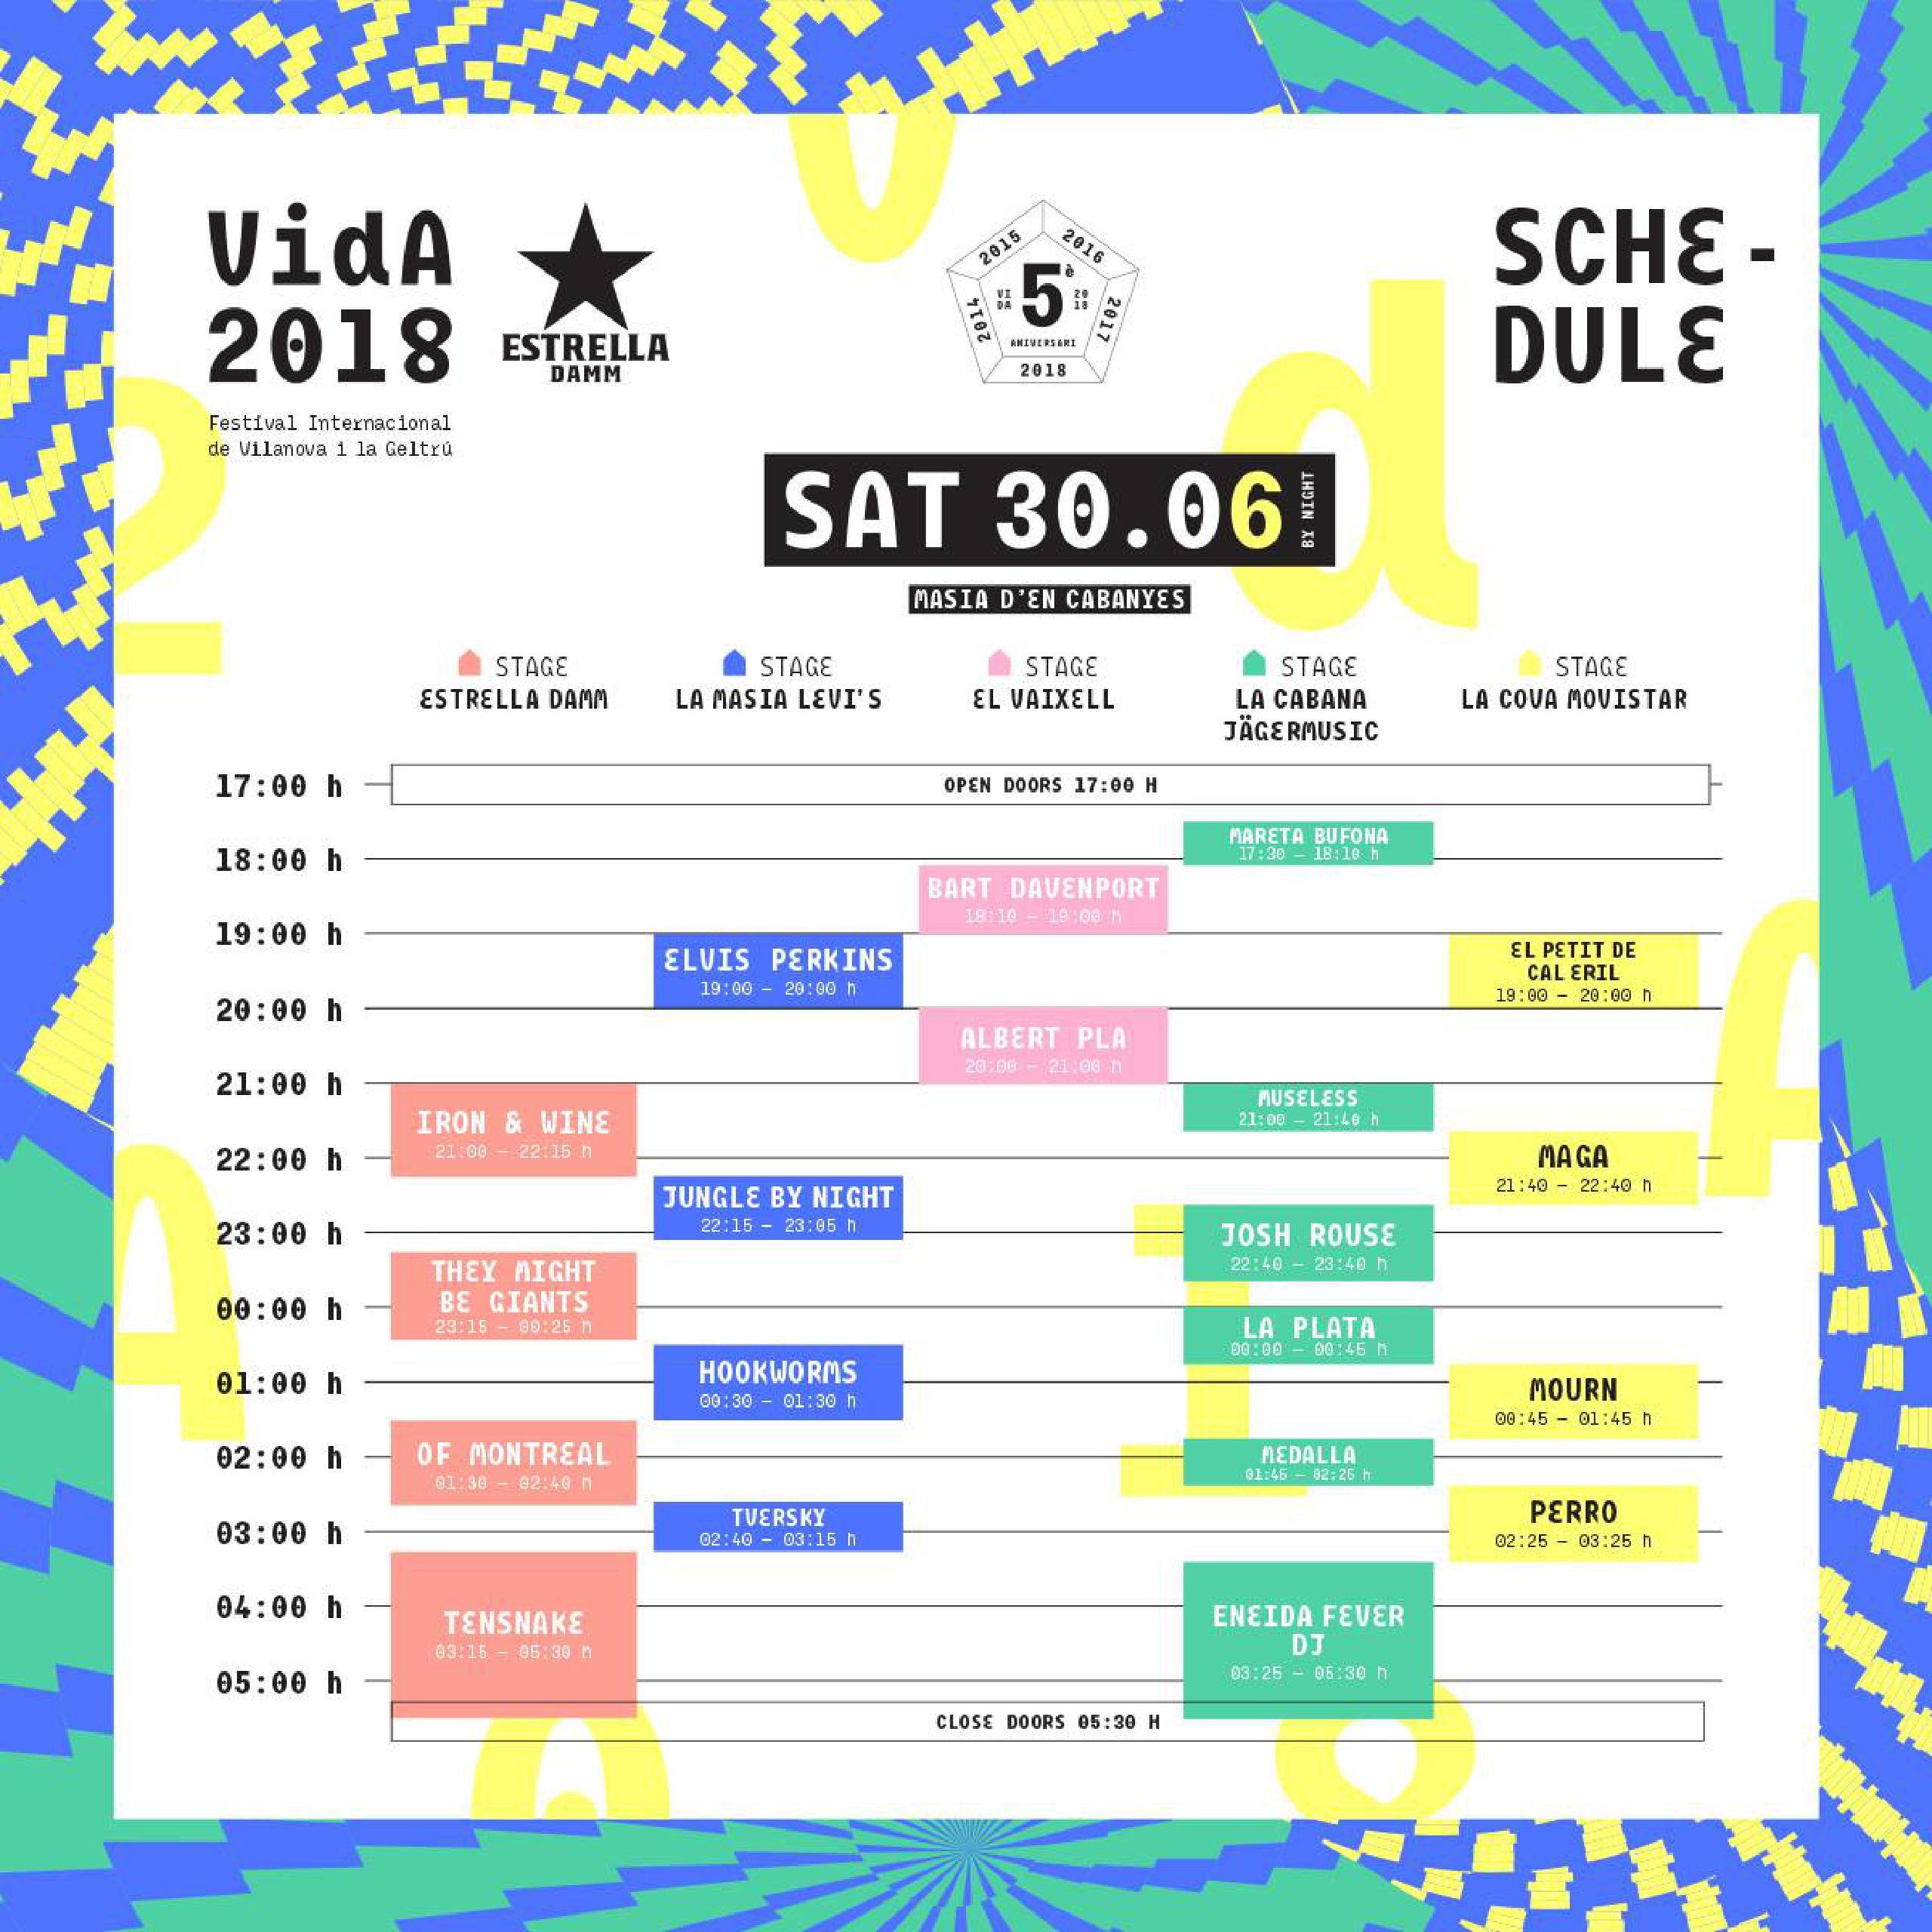 Horarios Vida Festival 2018 sábado